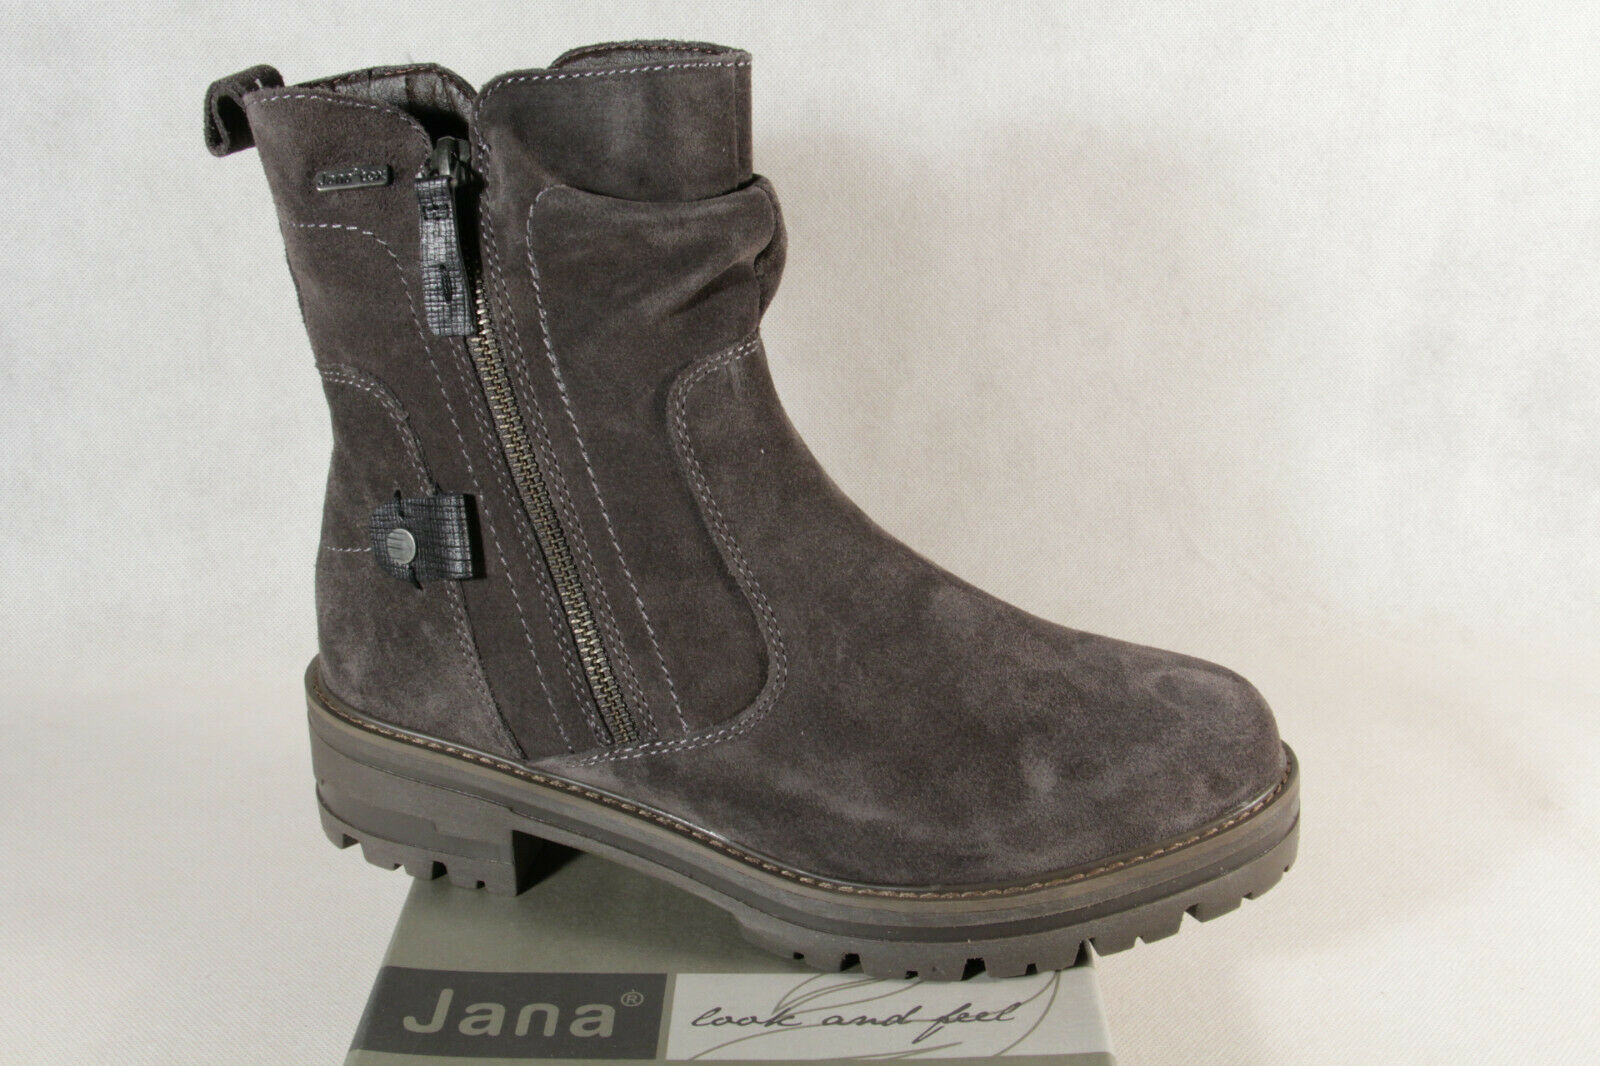 Jana-Tex Damen Stiefelette Stiefel Stiefel Winterstiefel grau Echtleder 26427 NEU